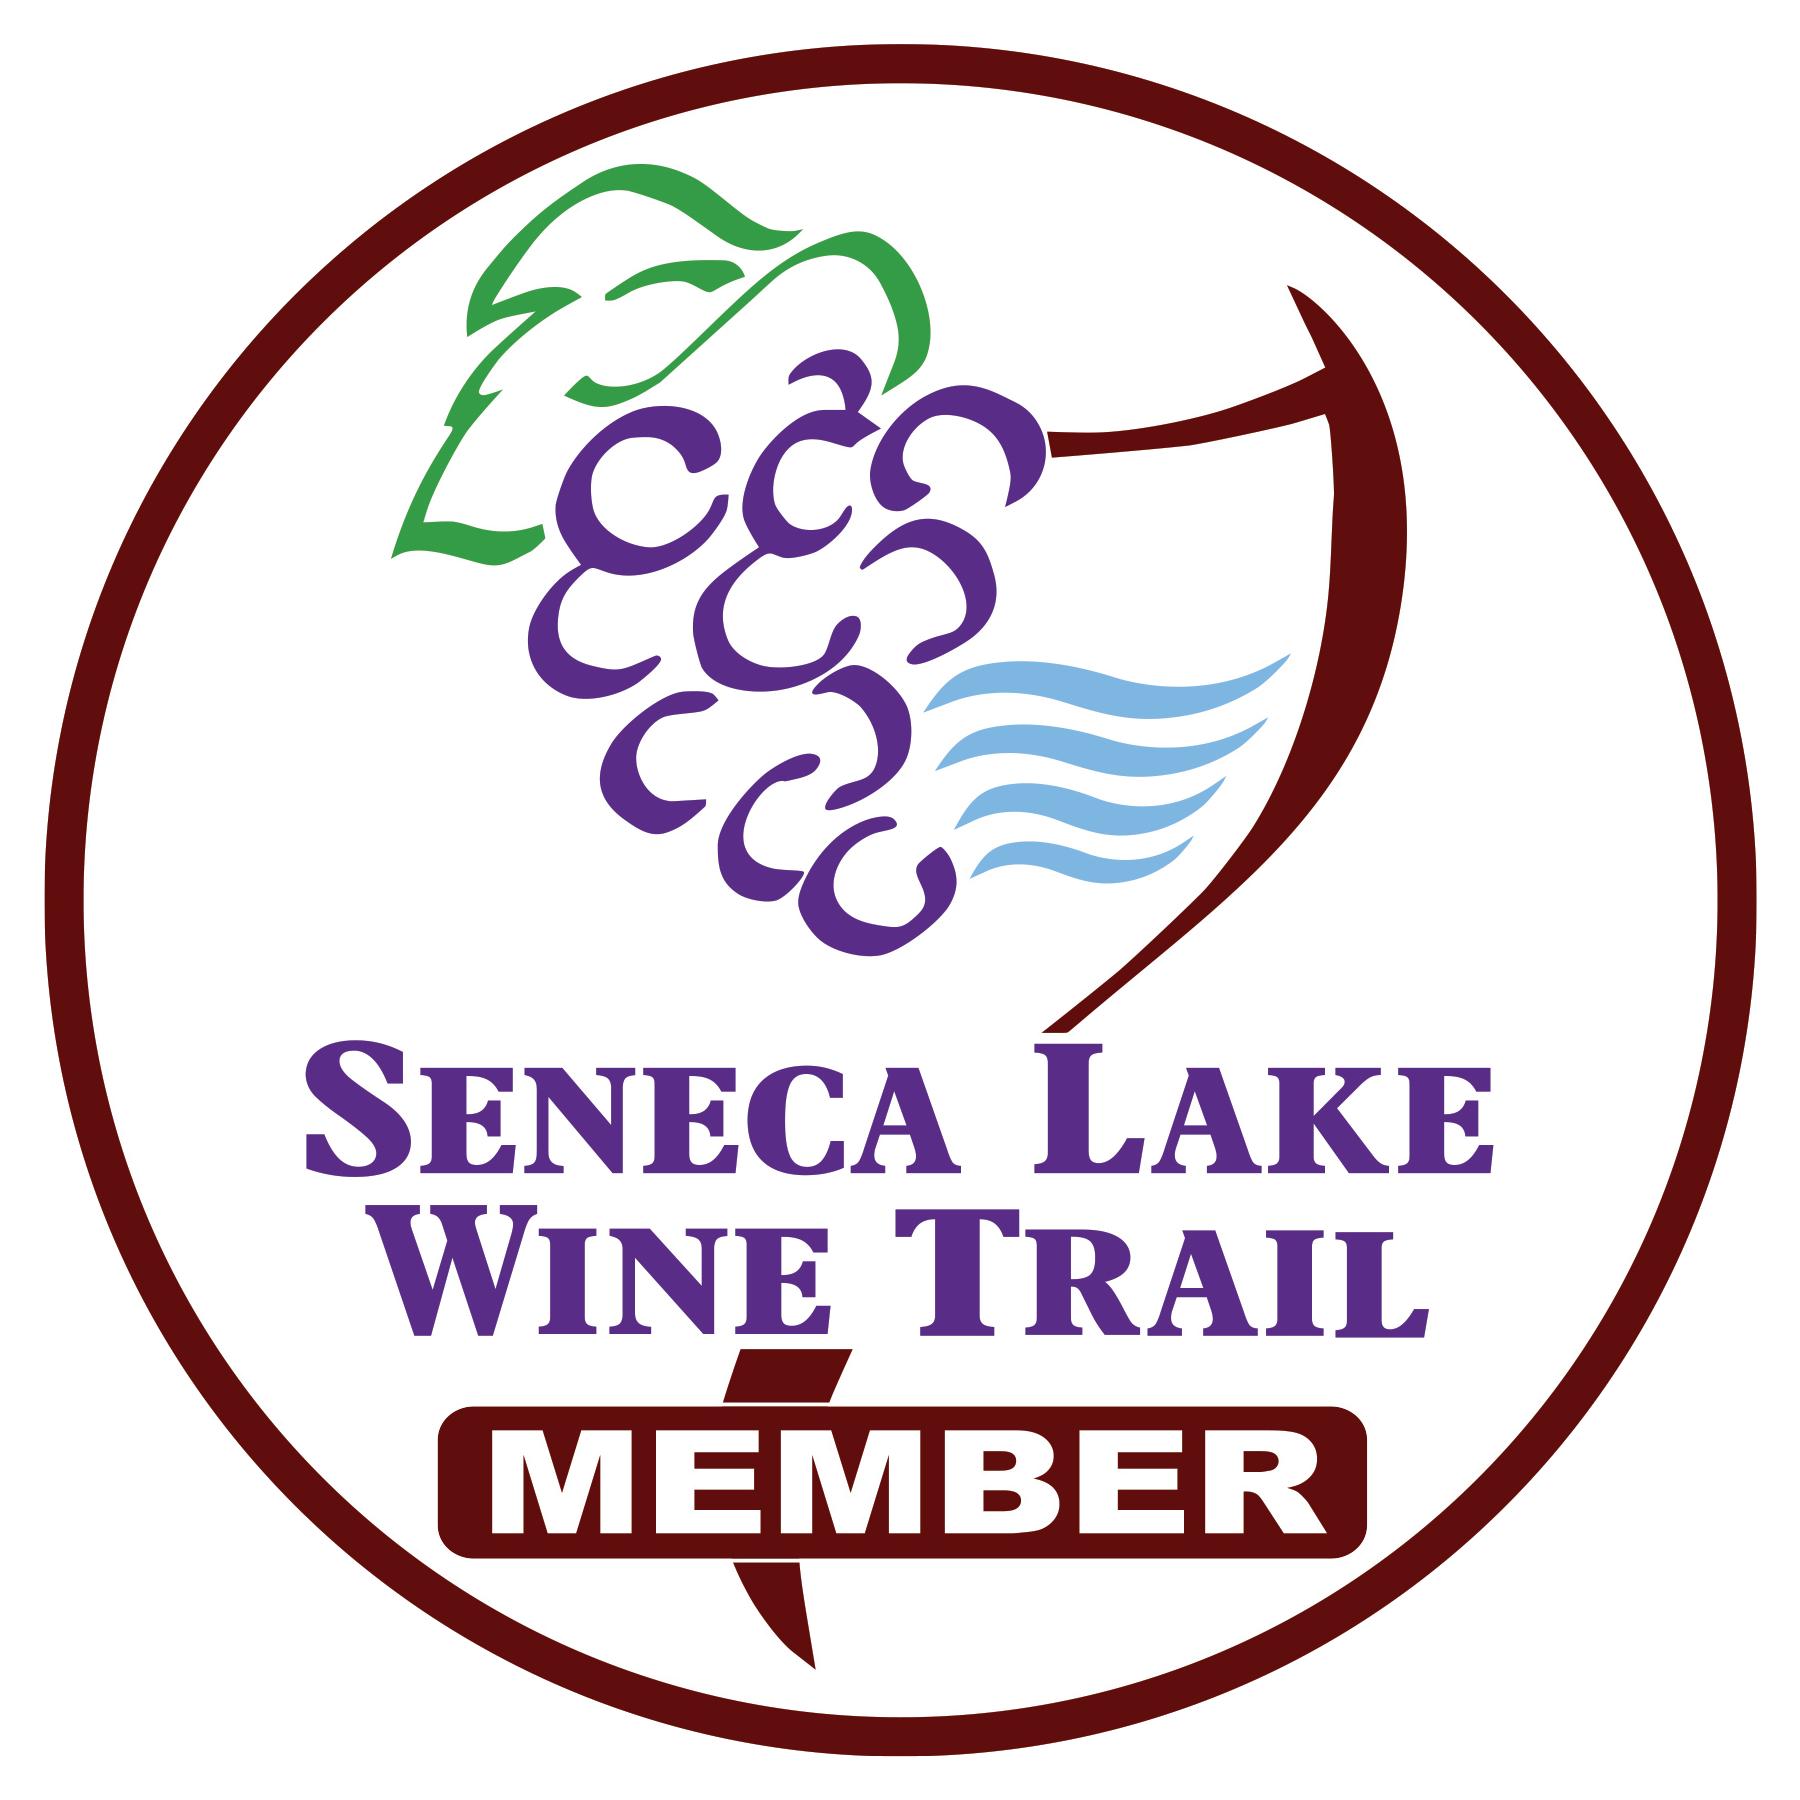 Finger Lakes - Seneca Lake Wine Trail in Finger Lakes Wine